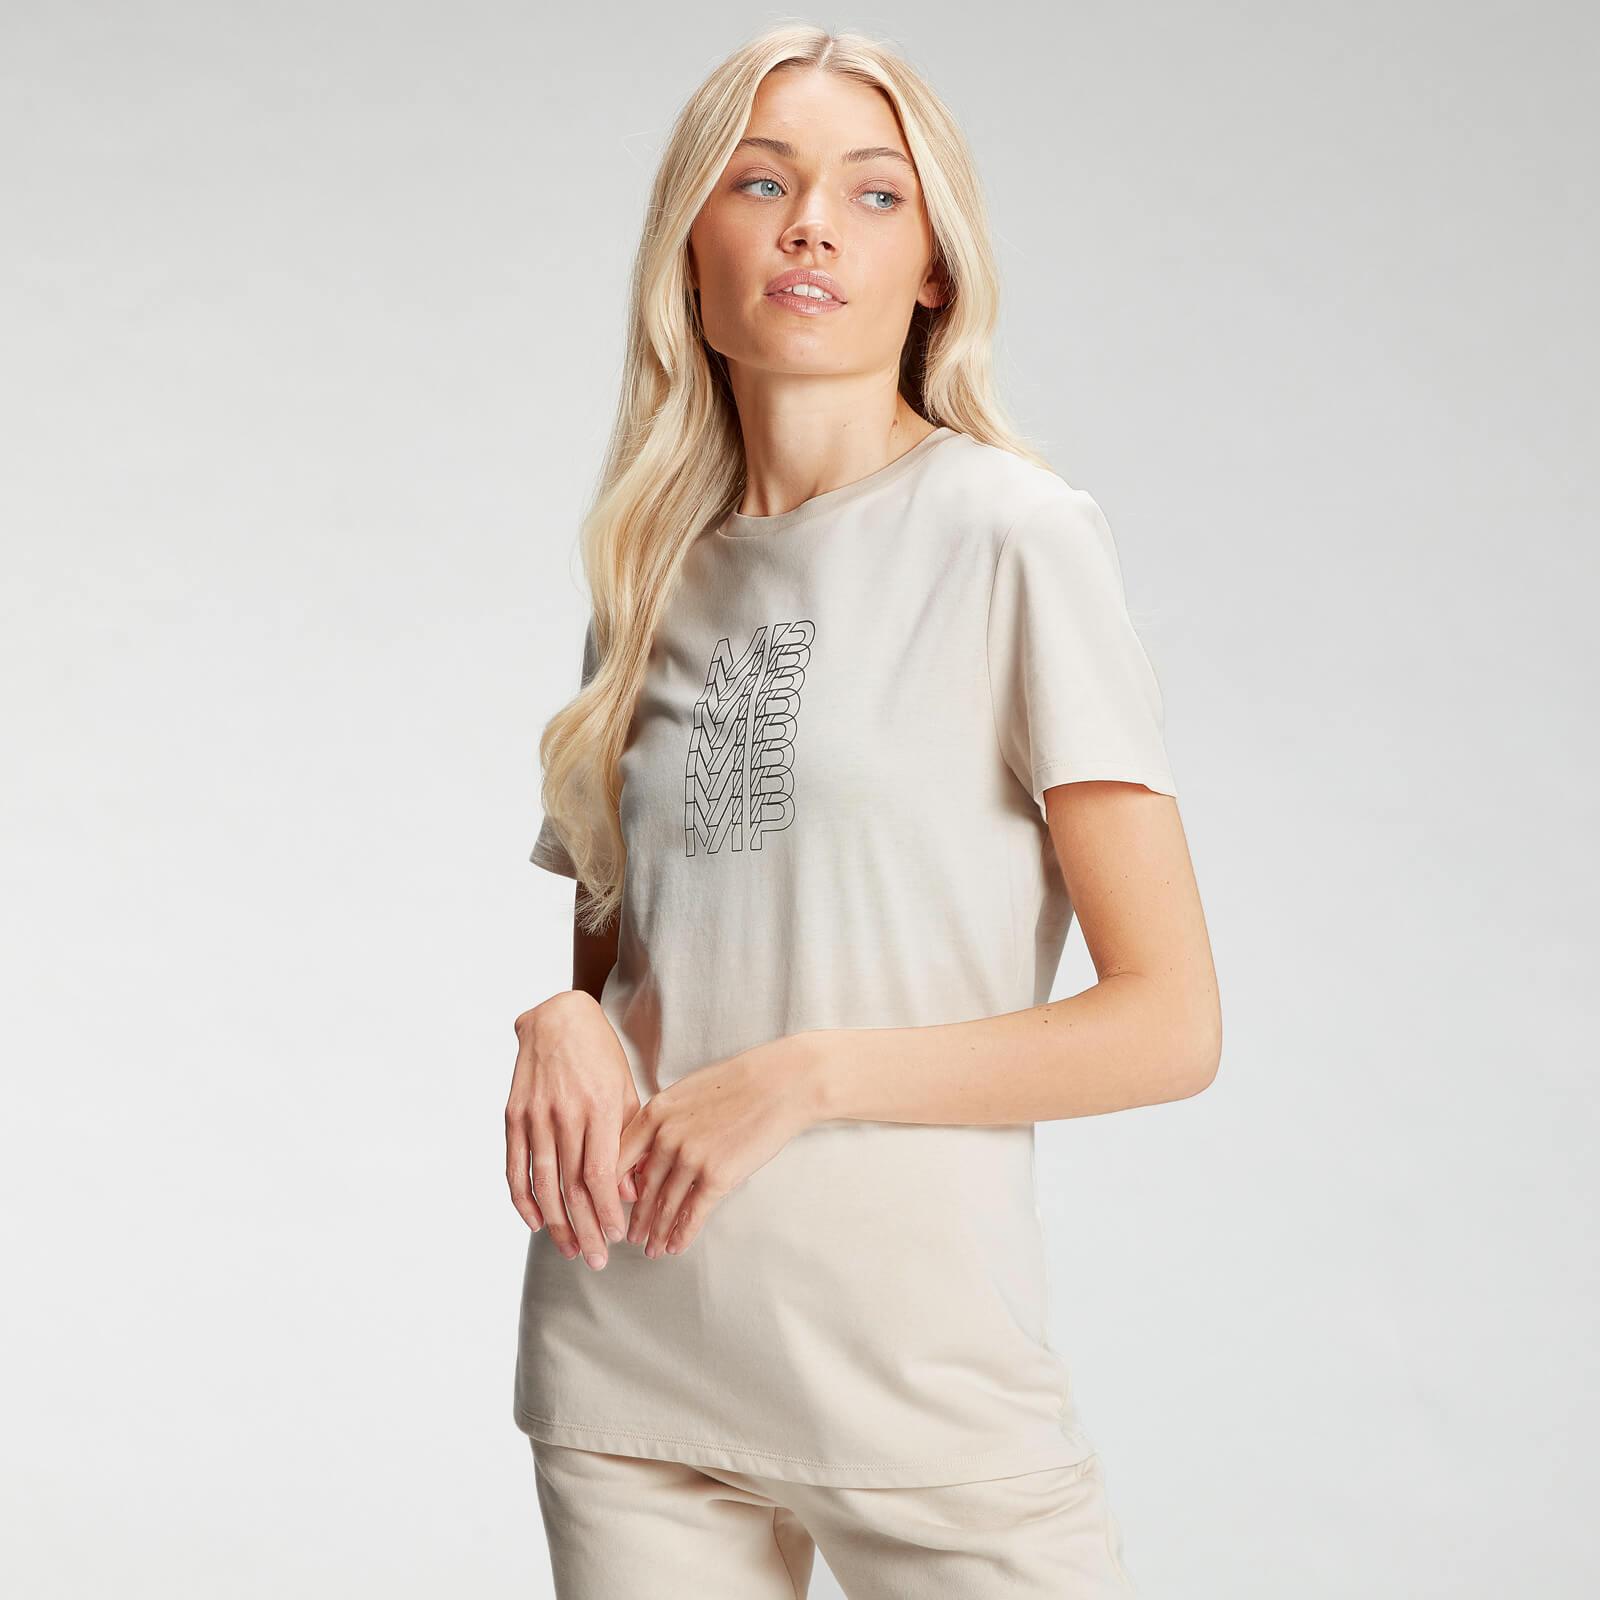 Купить MP Women's Repeat MP T-Shirt - Ecru - XXL, Myprotein International